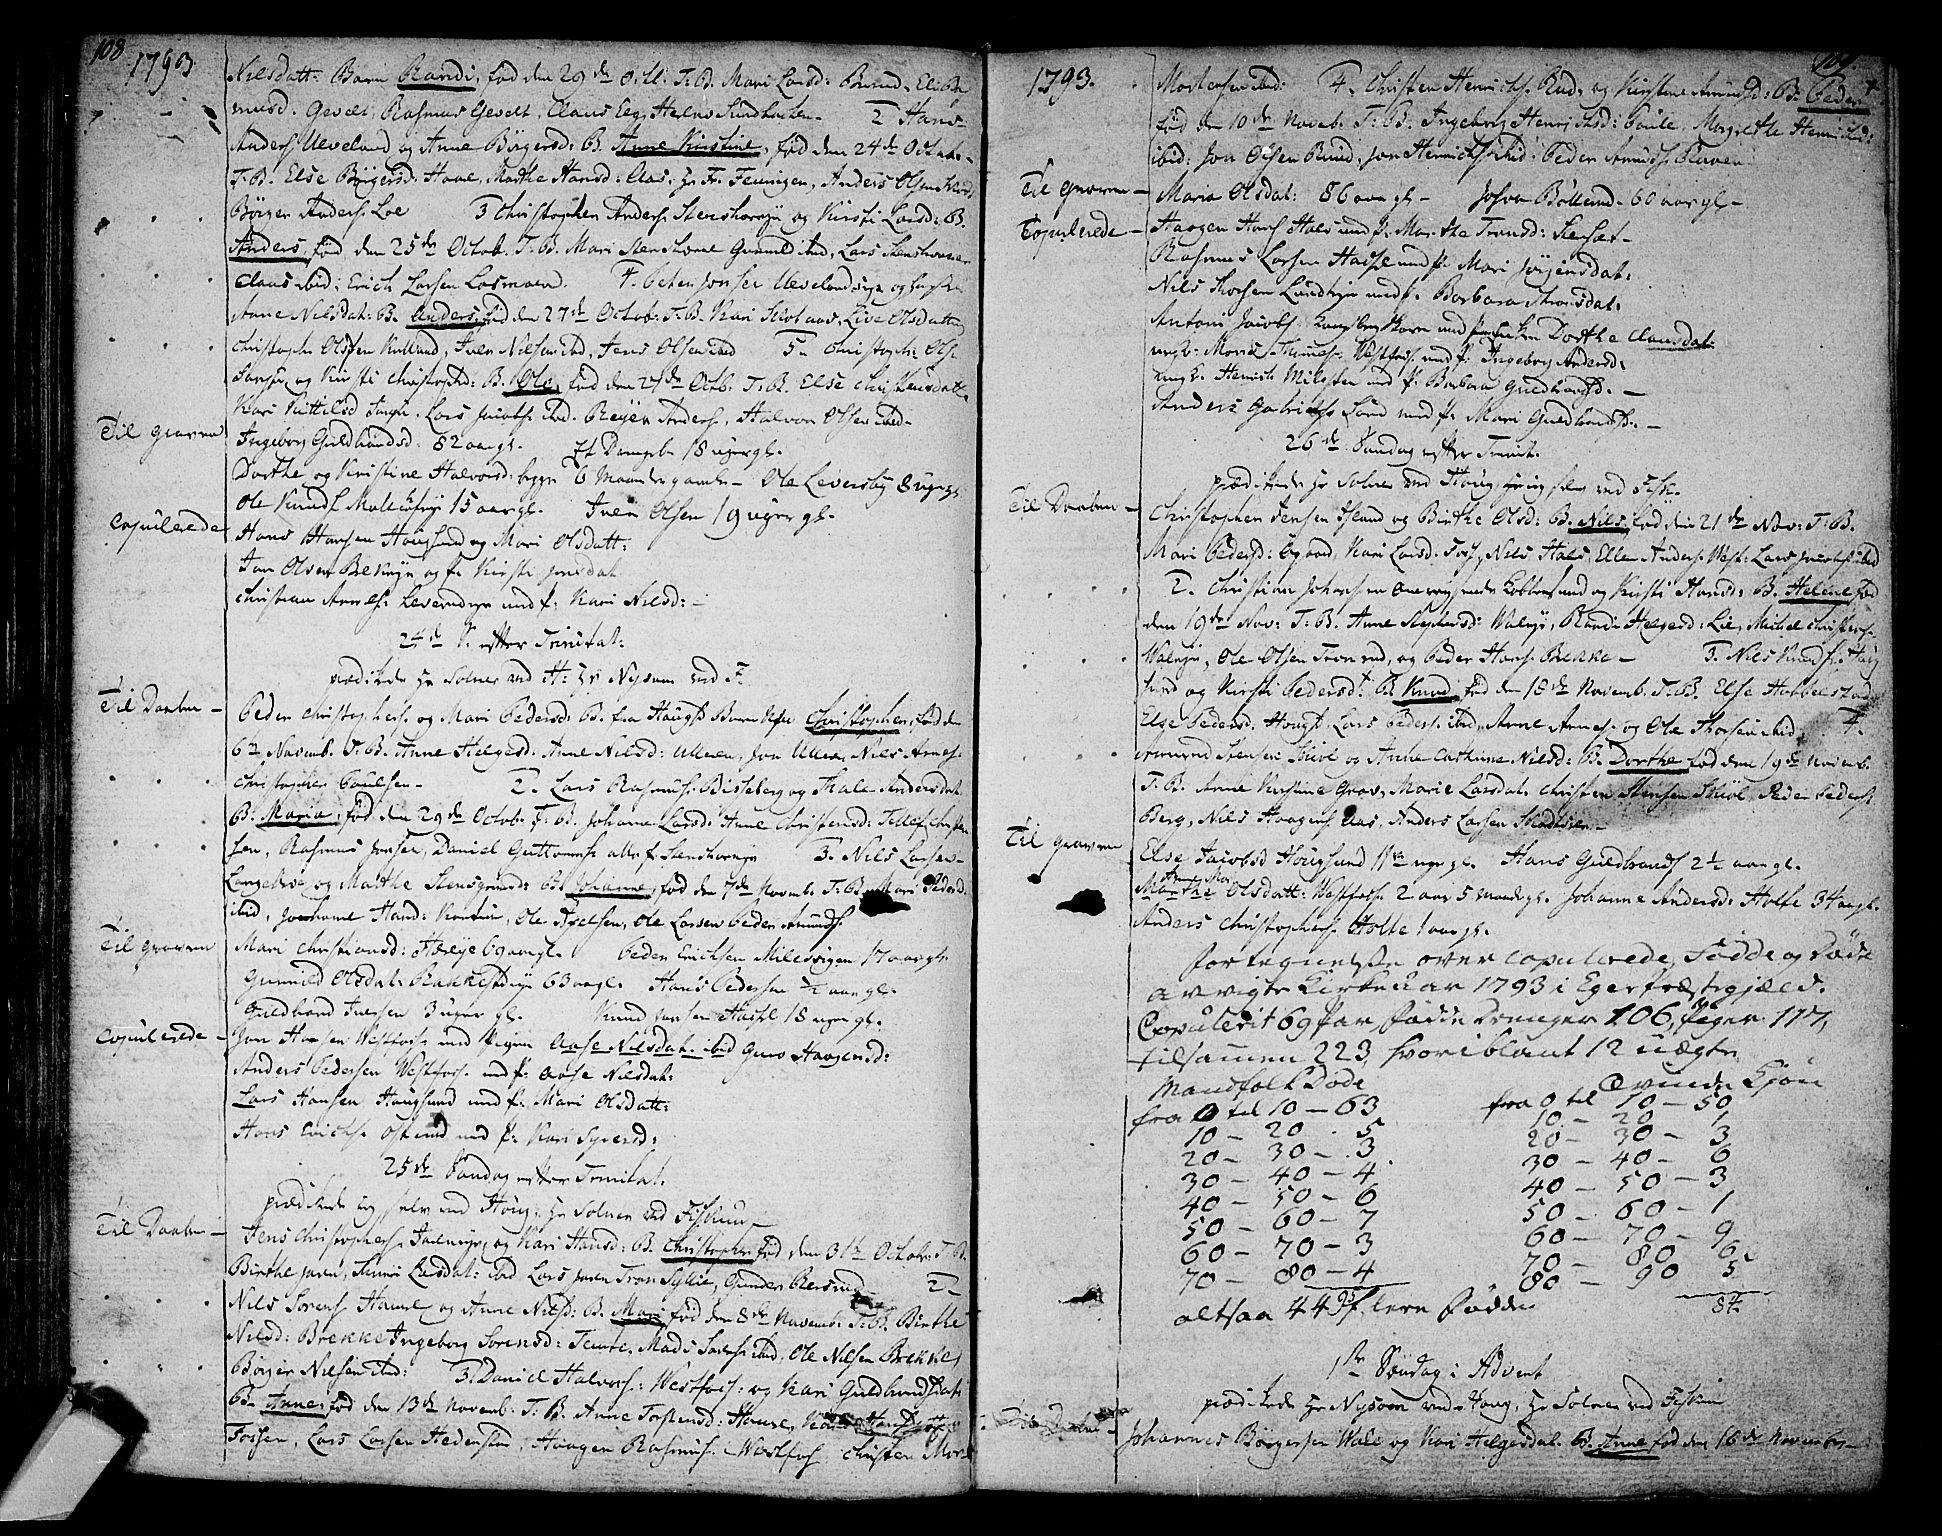 SAKO, Eiker kirkebøker, F/Fa/L0009: Ministerialbok nr. I 9, 1789-1806, s. 108-109